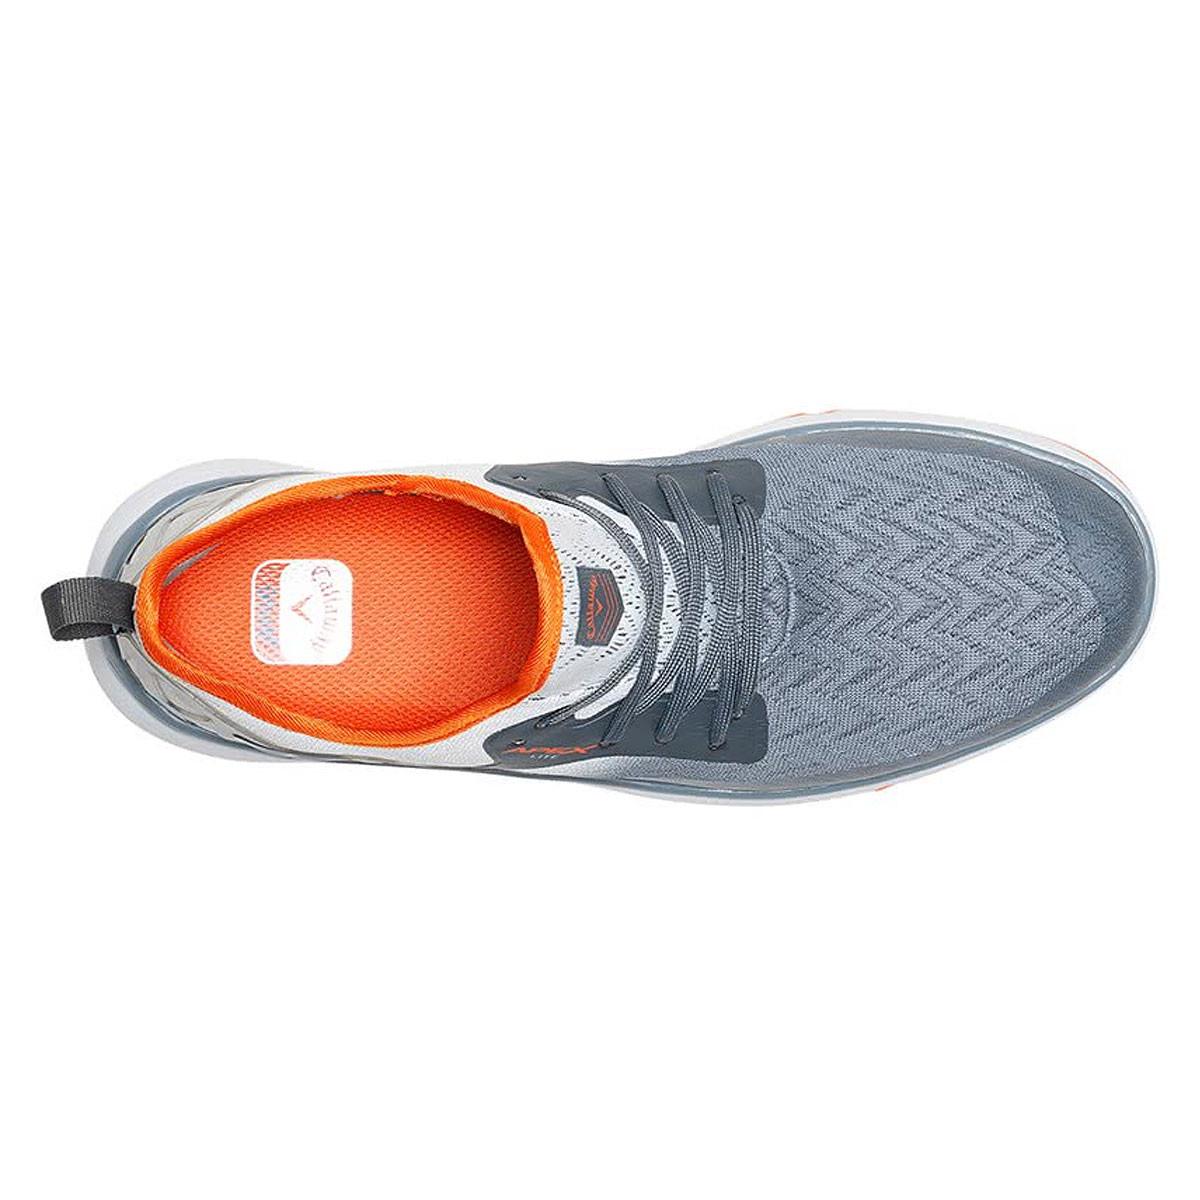 callaway apex lite shoes review 6e46b 50259